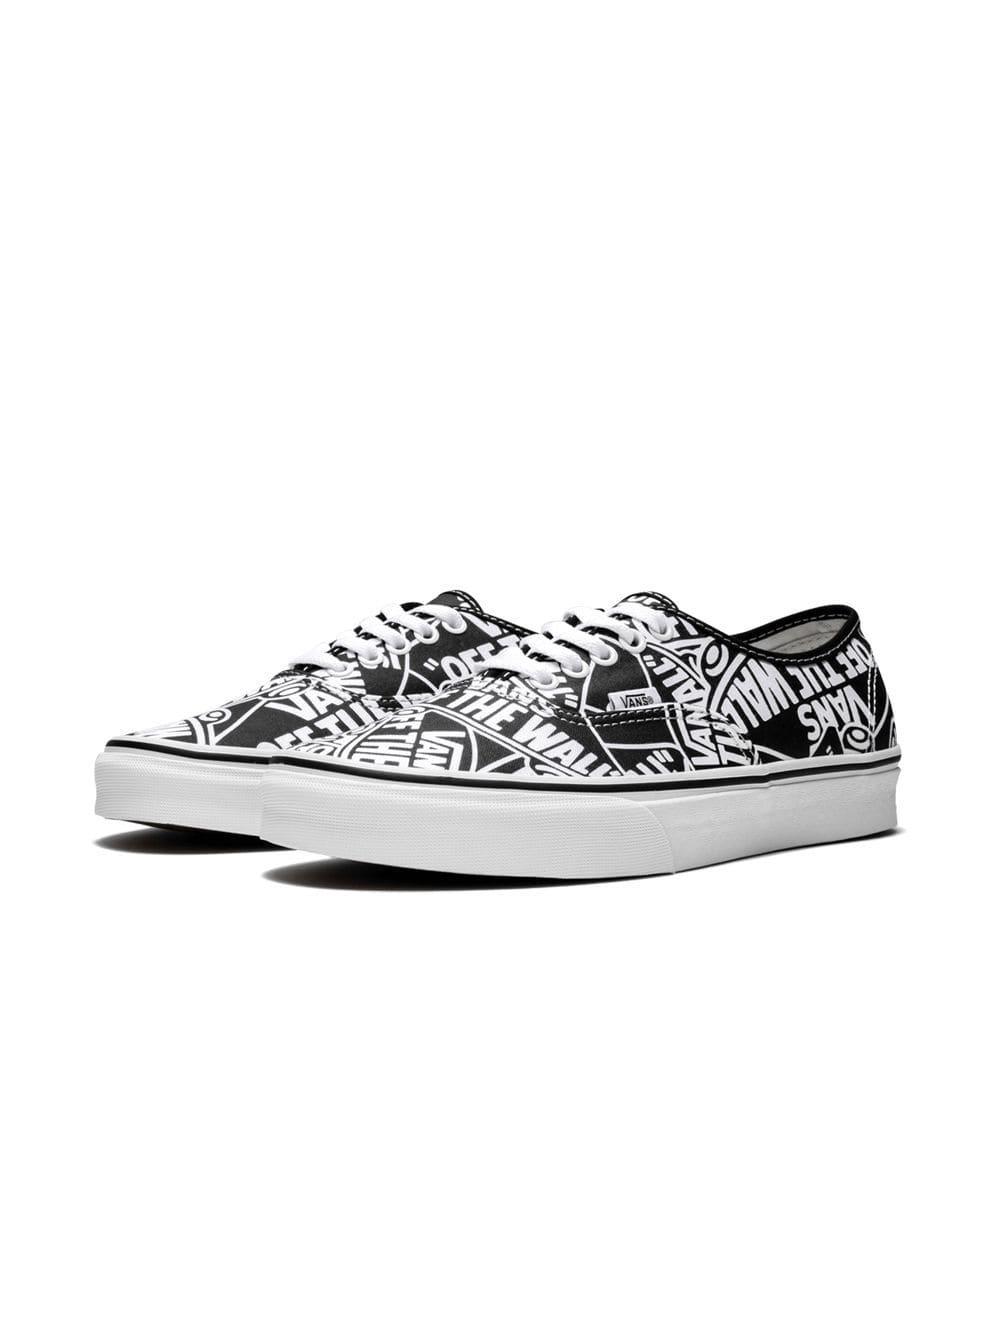 66249773966 Vans - Black Authentic Otw Repeat Sneakers for Men - Lyst. View fullscreen